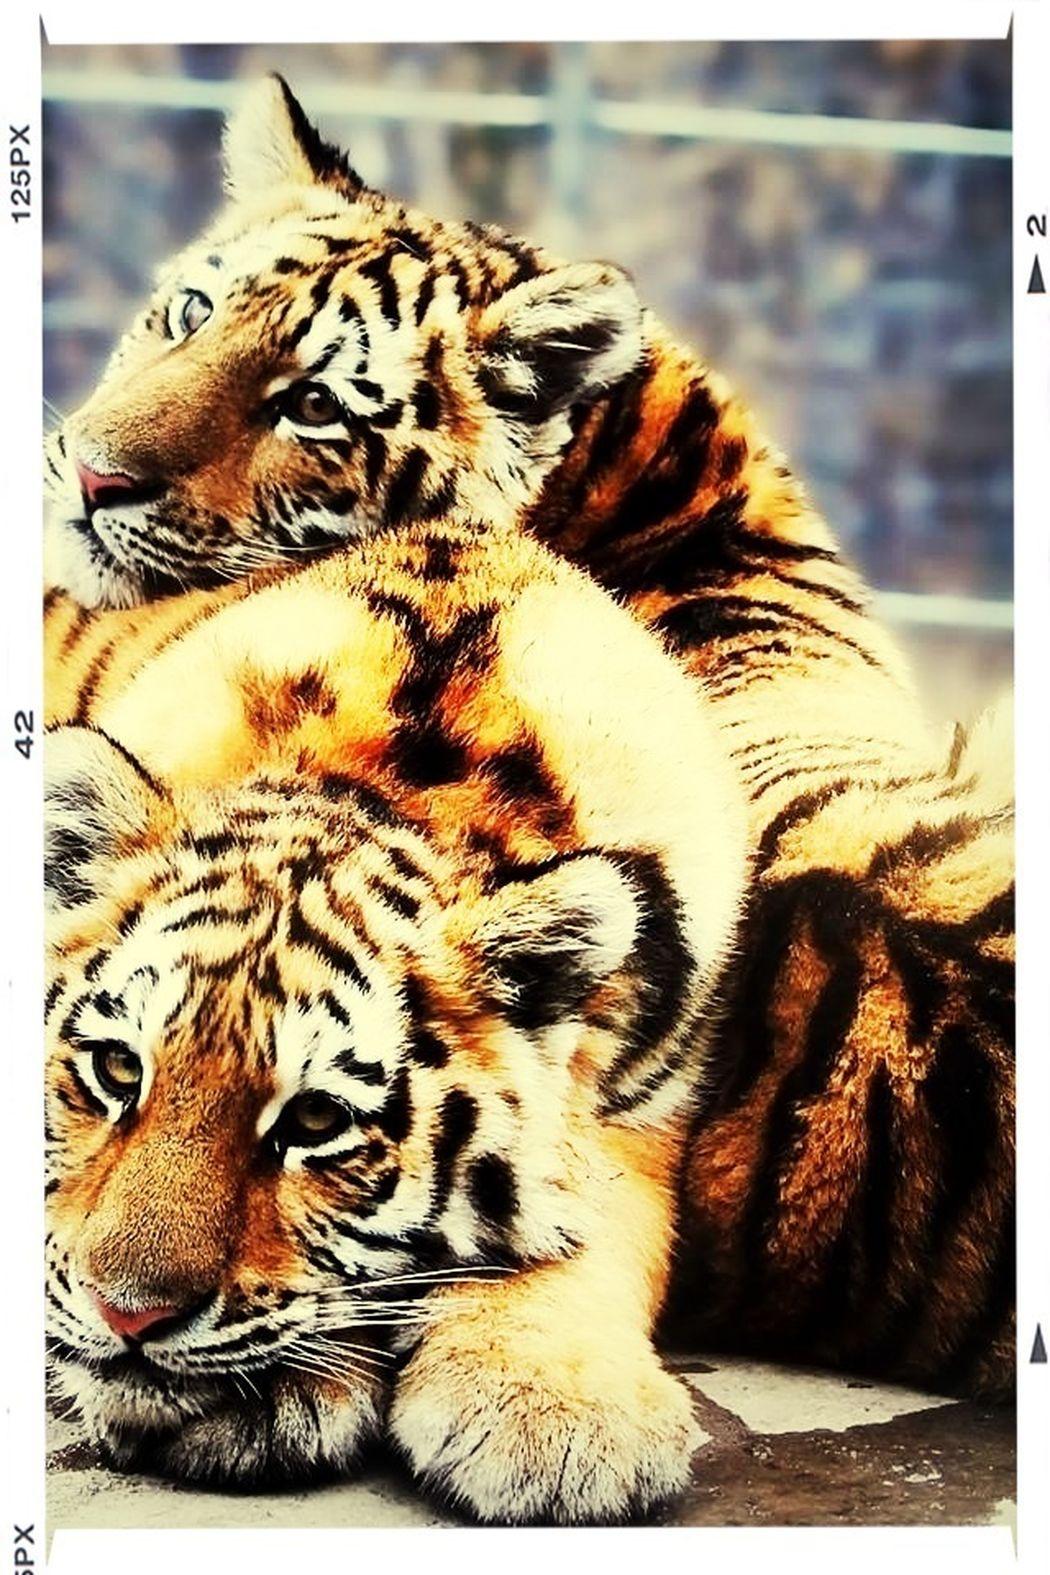 Tiger #tiger #wild #animal